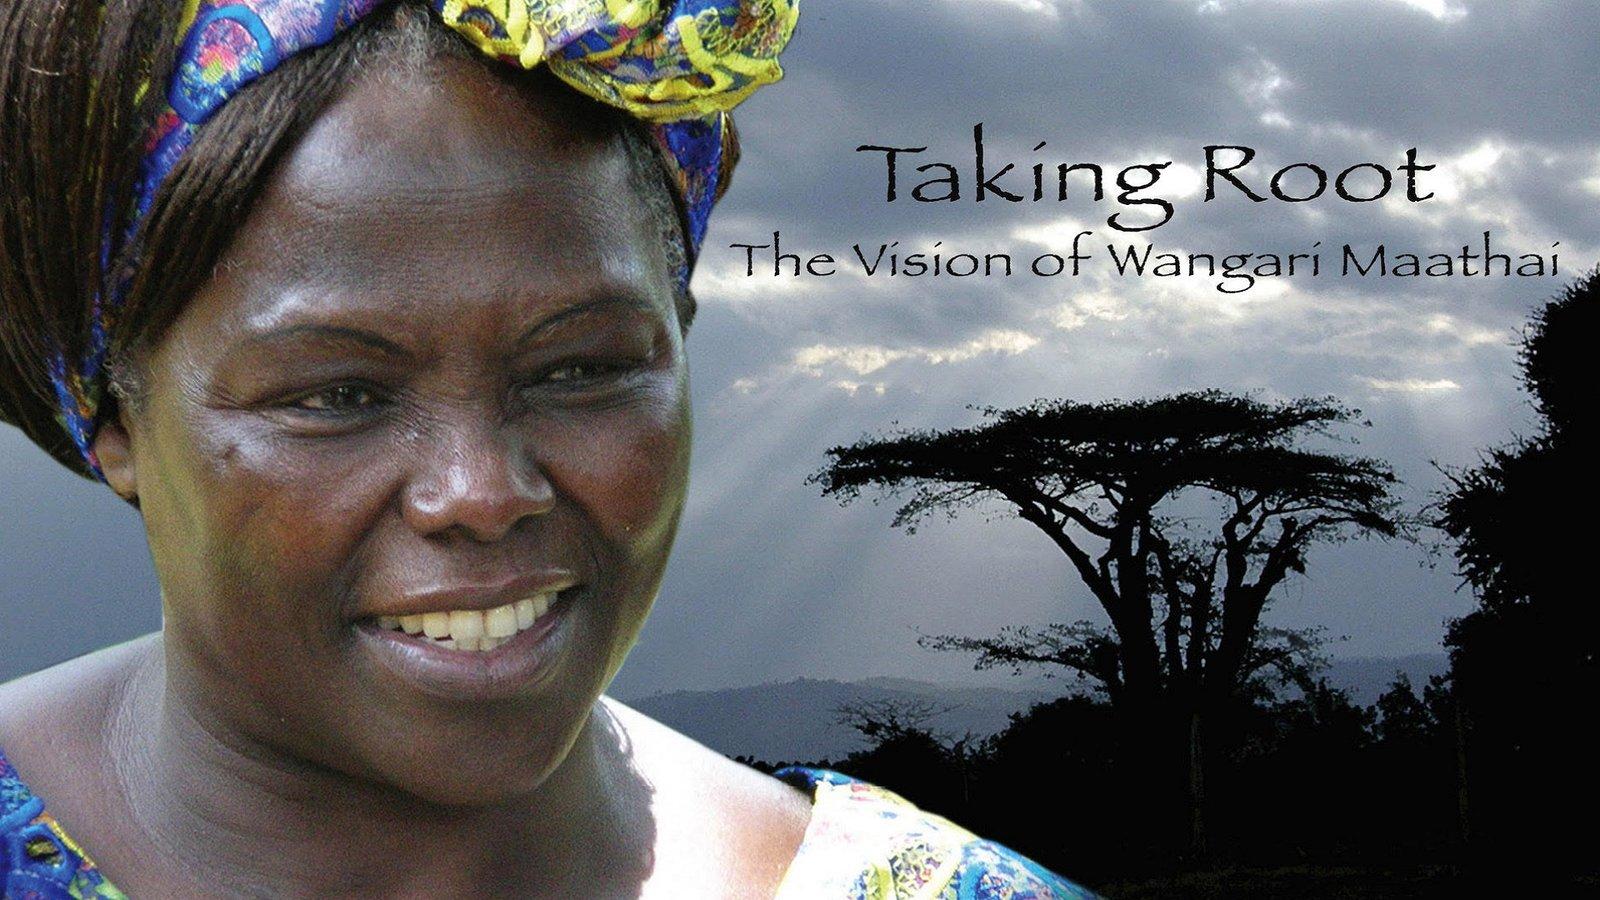 Taking Root - The Vision of Environmentalist Wangari Maathai